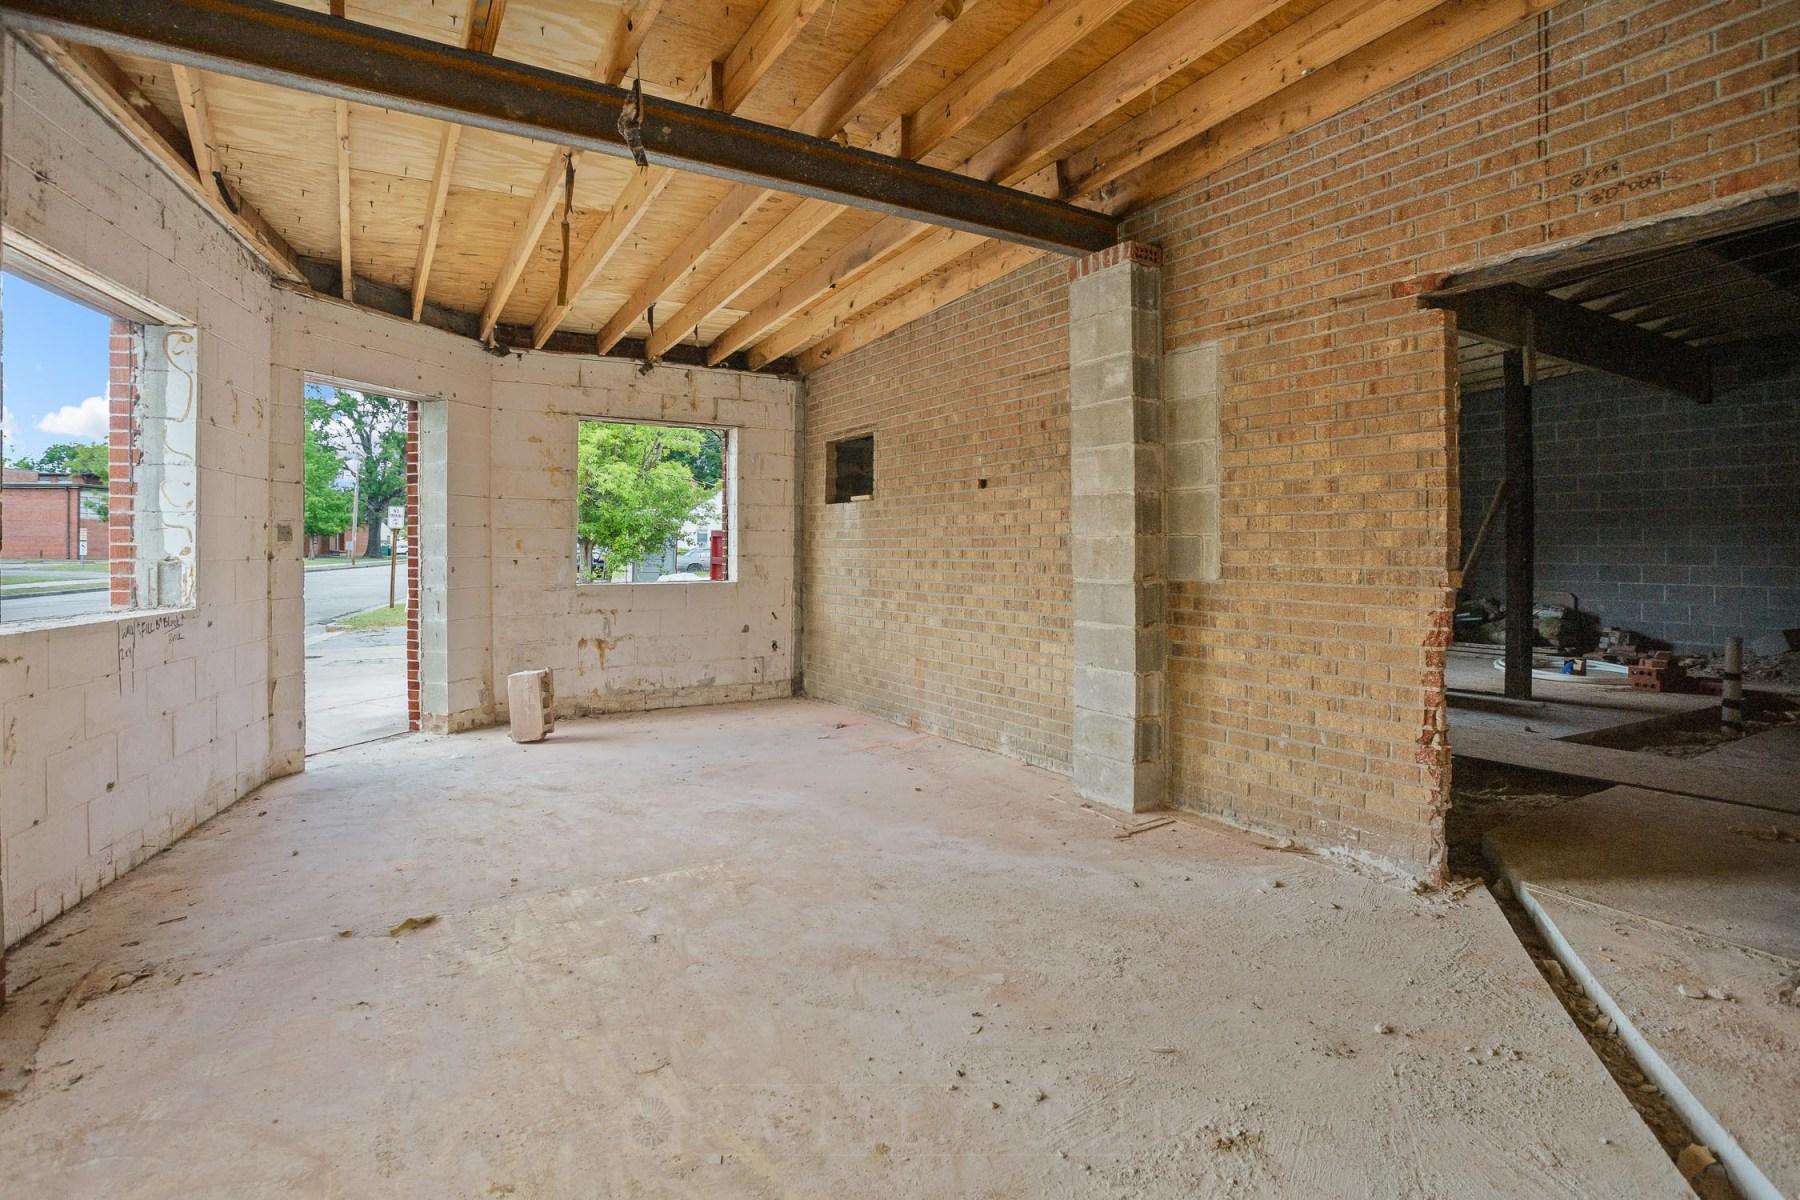 Horizons-East-Office-Renovation-1st-Set-27May2021_SB_01277_web-size